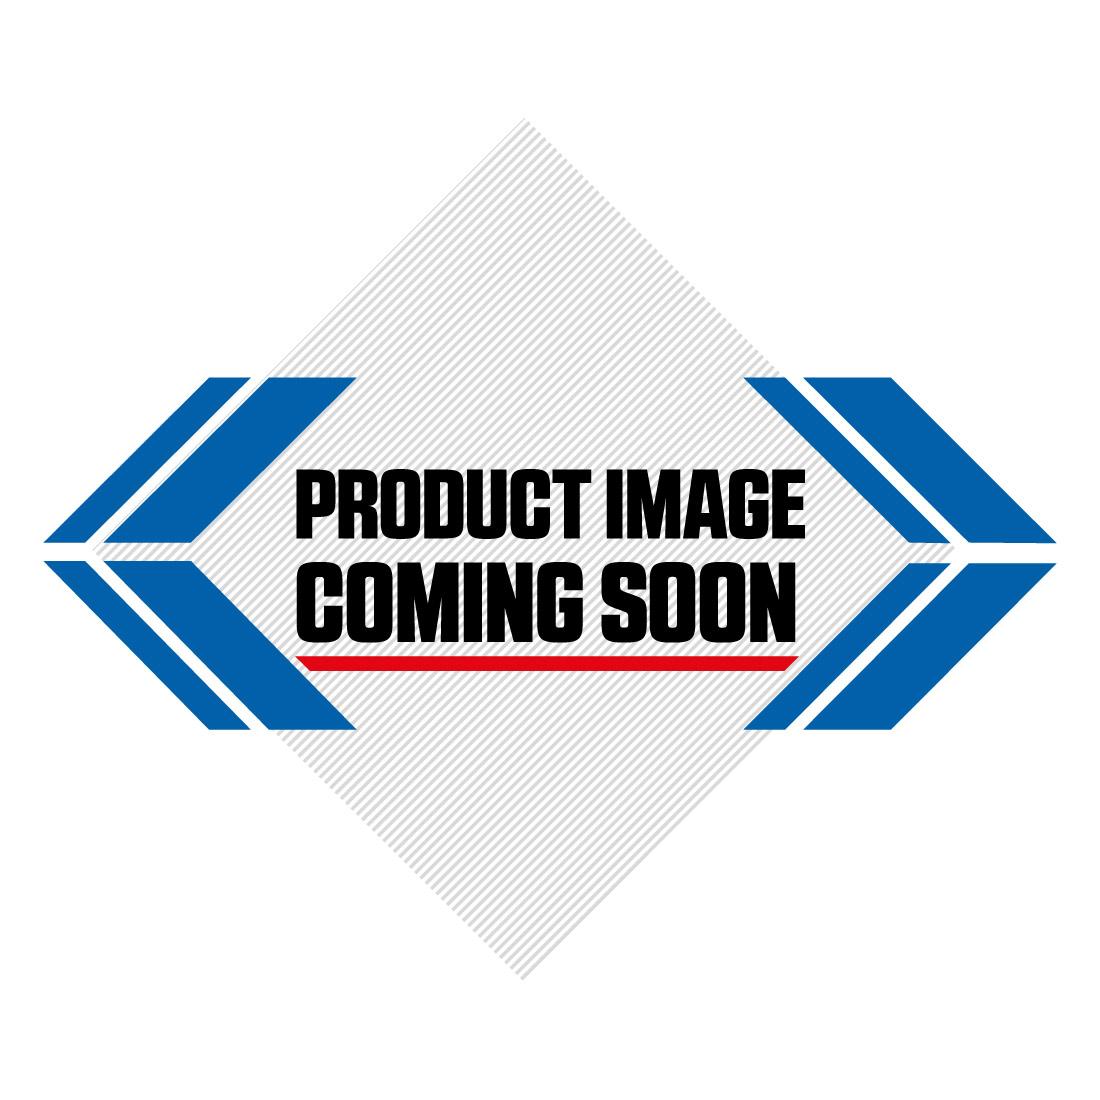 DJI Mavic 2 Pro Drone Image-7>